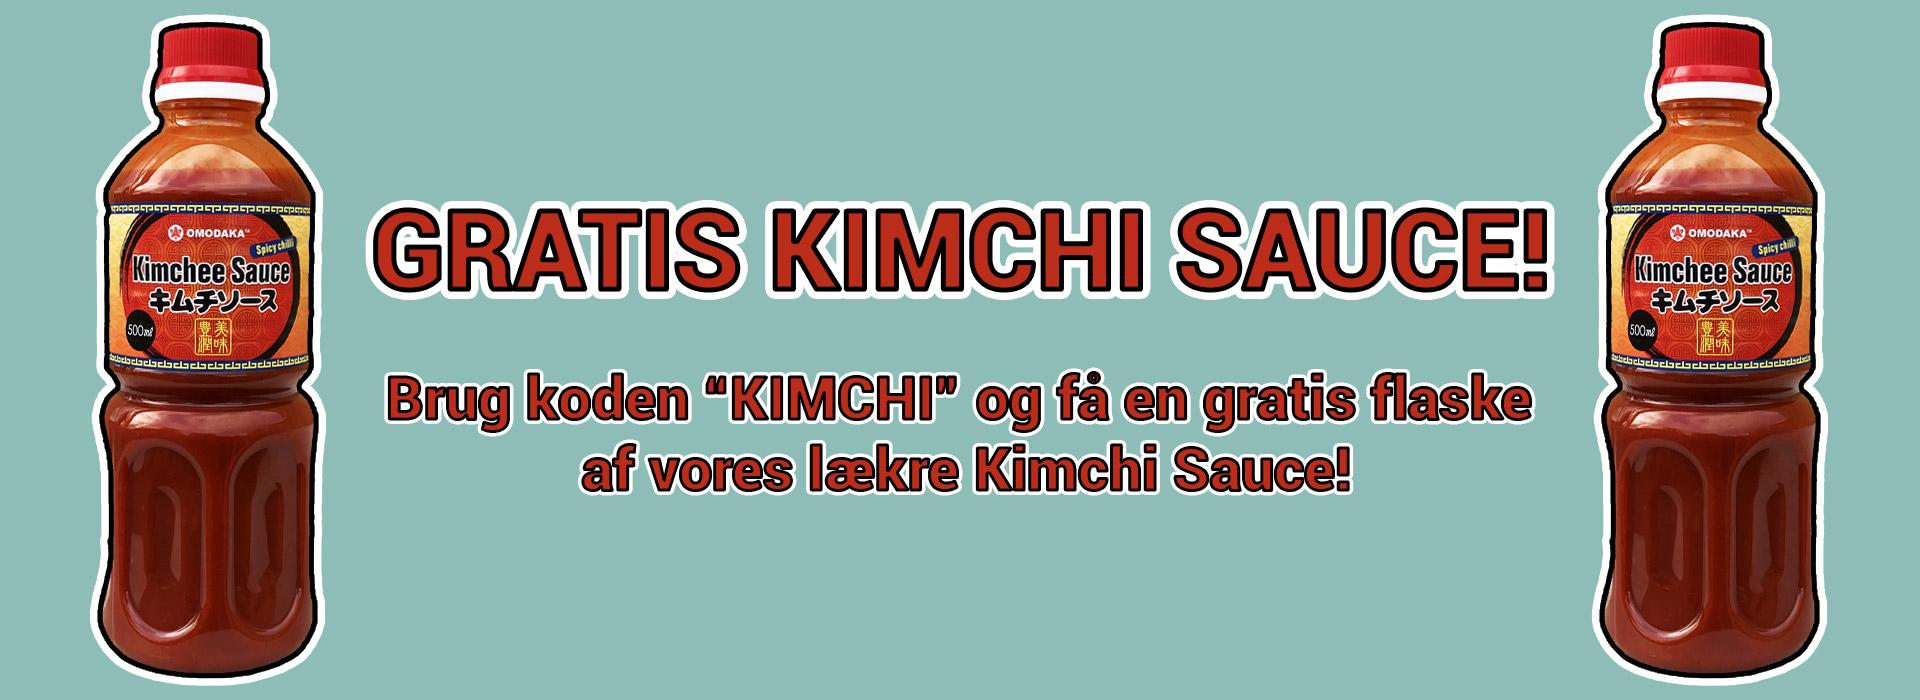 Gratis Kimchi Sauce